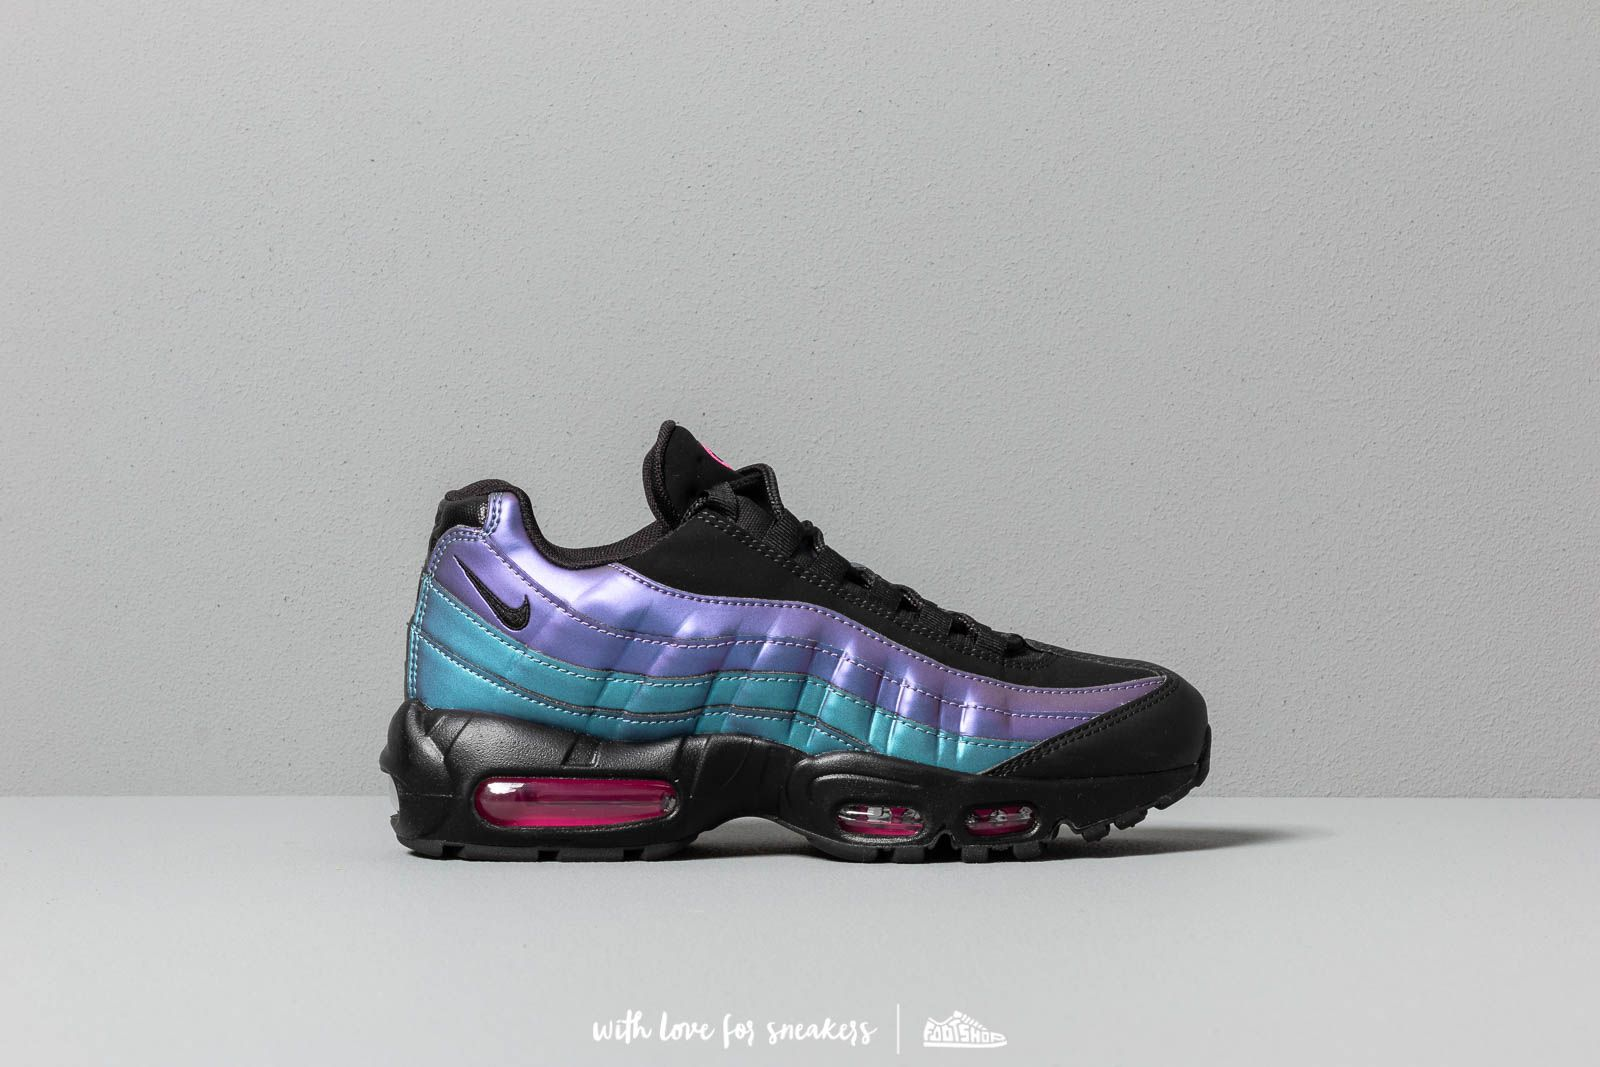 Nike Air Max 95 Premium Black Black Laser Fuchsia Footshop  Footshop